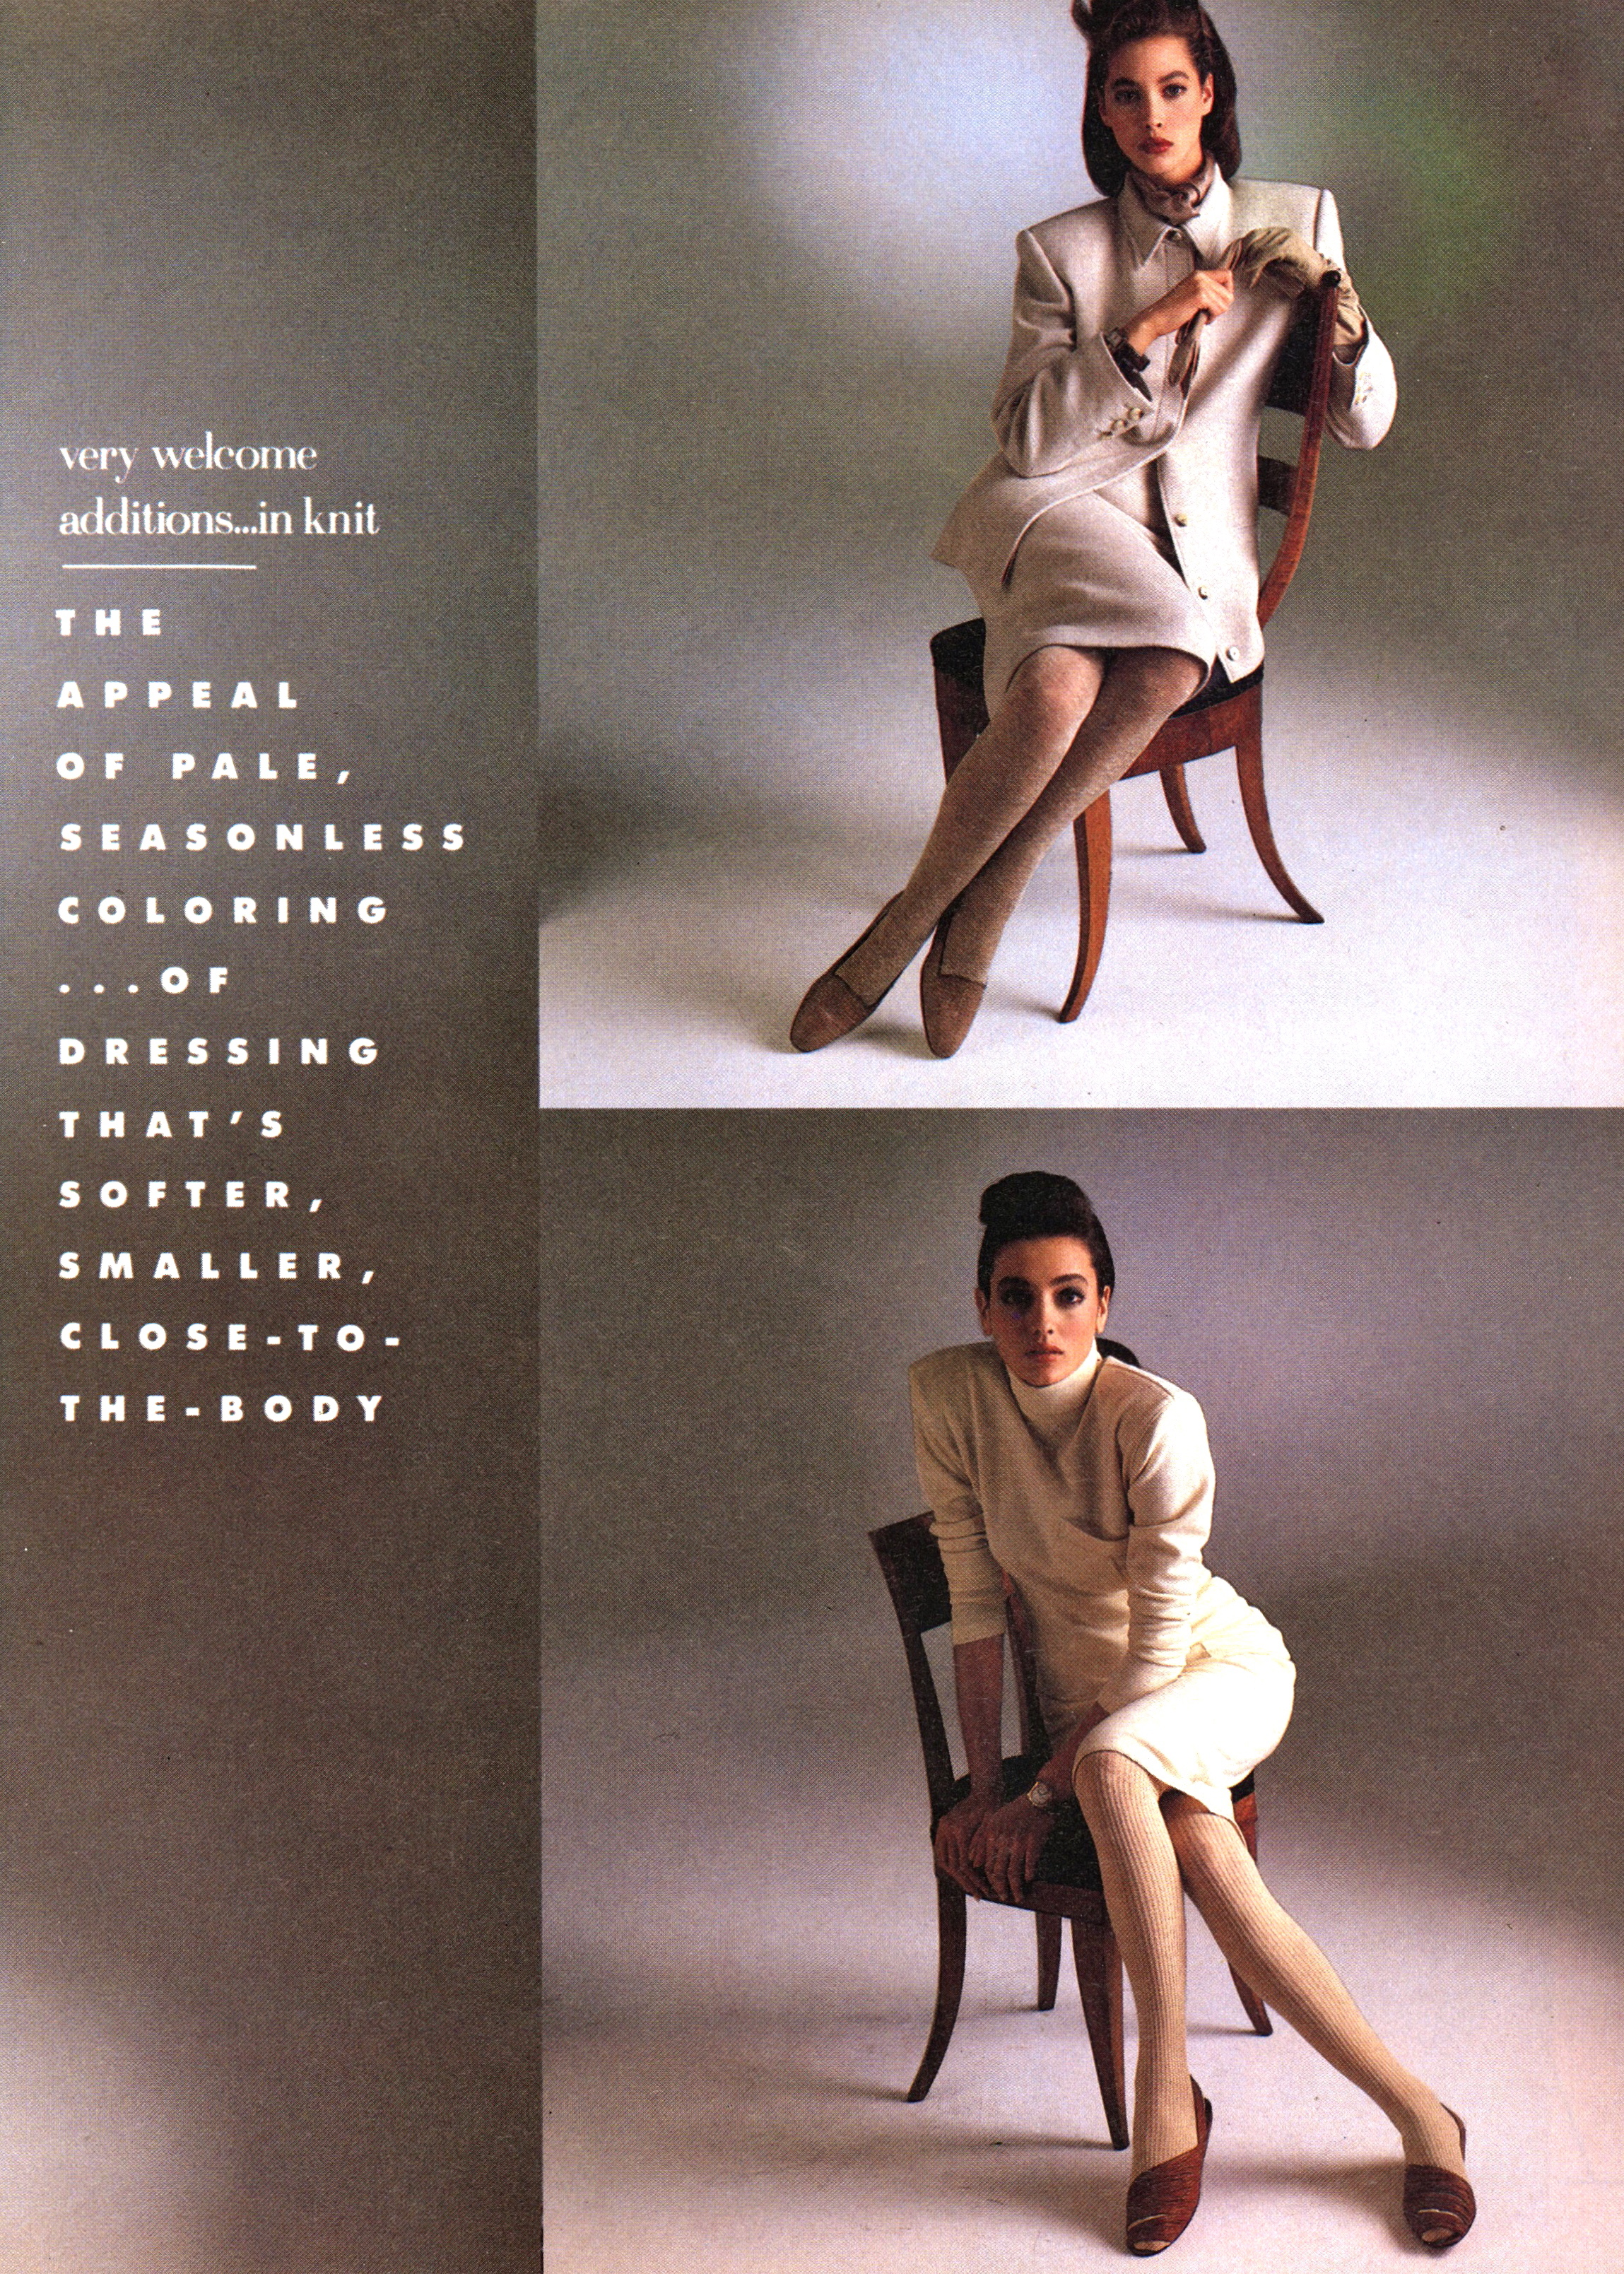 Vogue (US) June 1986 | Christy Turlington & Jose Toledo 08.jpg